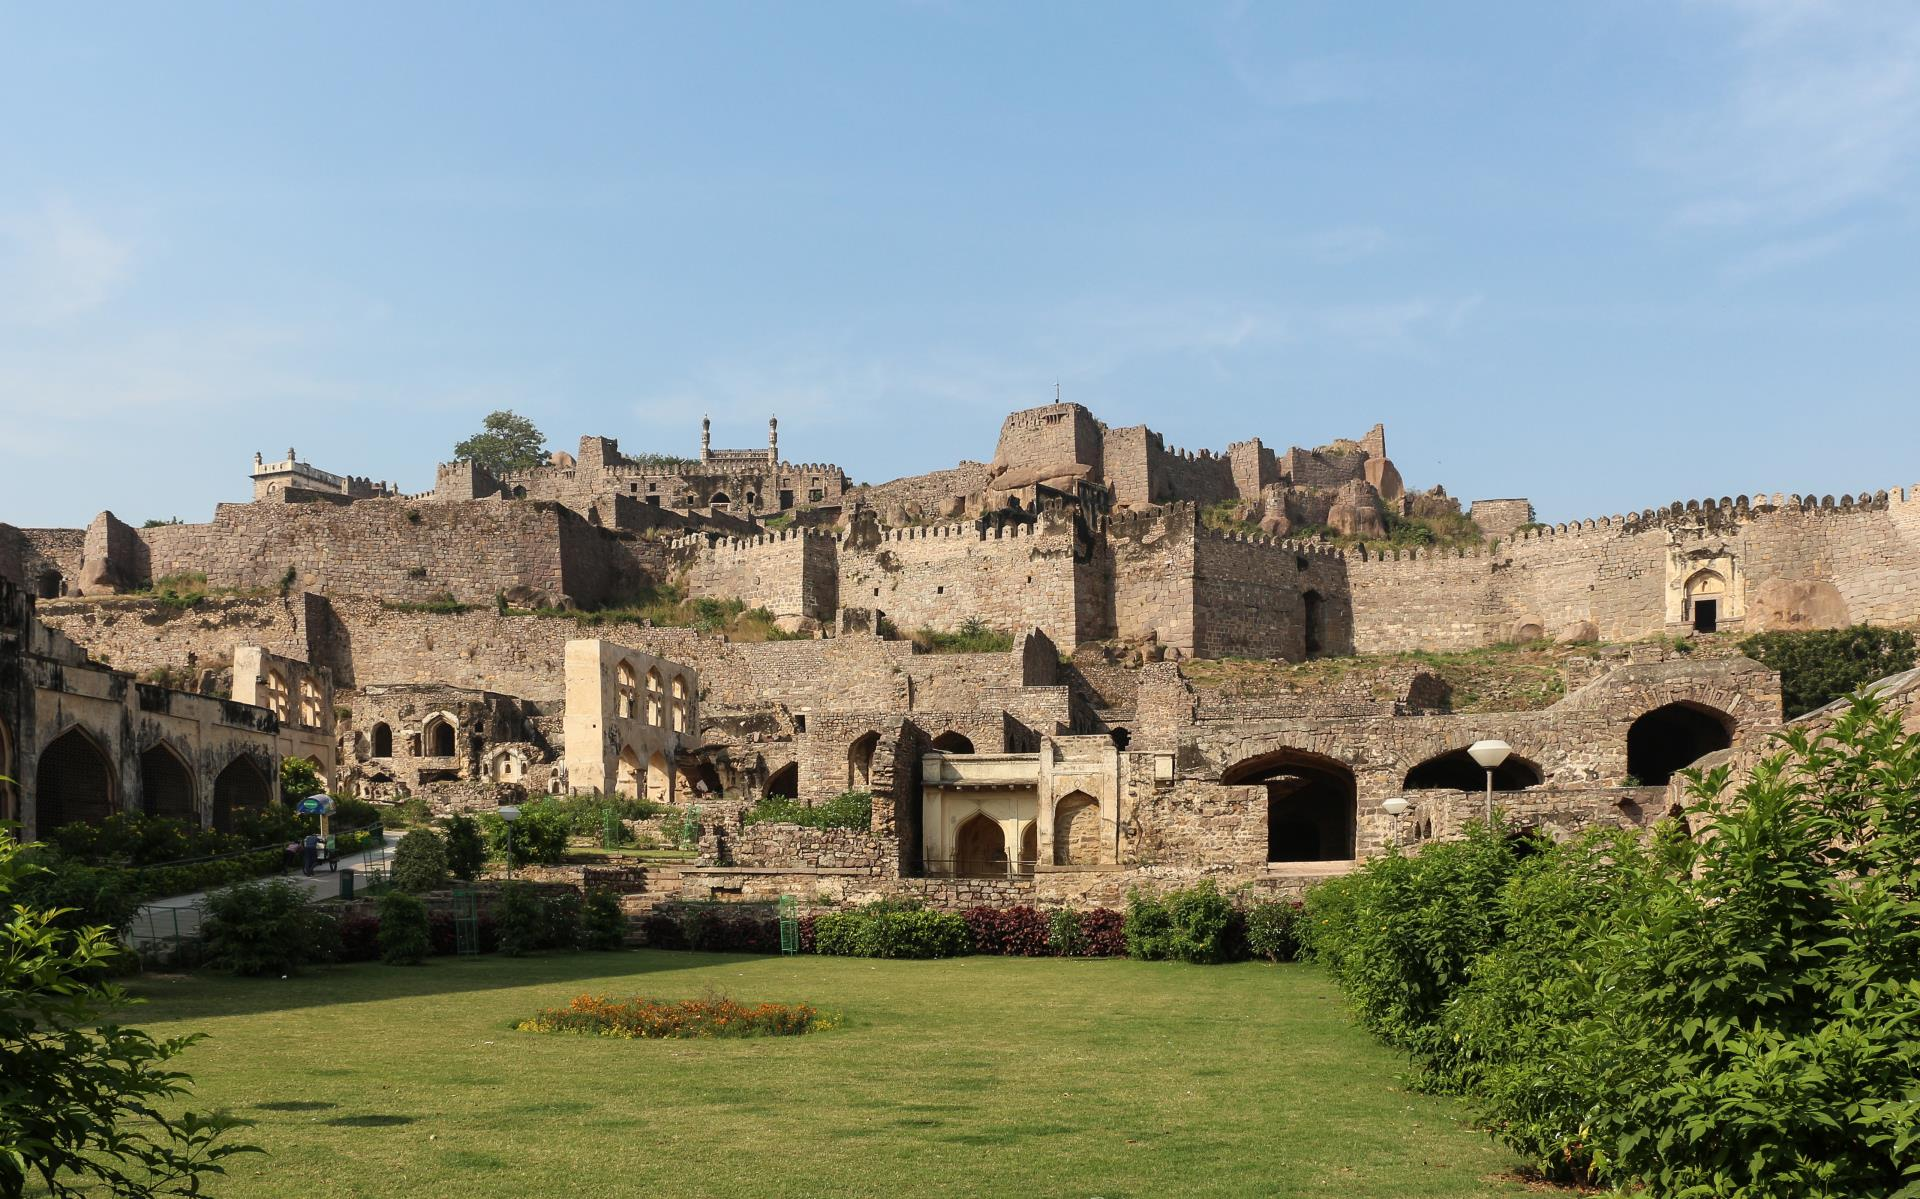 Hyderabad to Vadodara Drive to Explore the Man-made Wonder of India 9